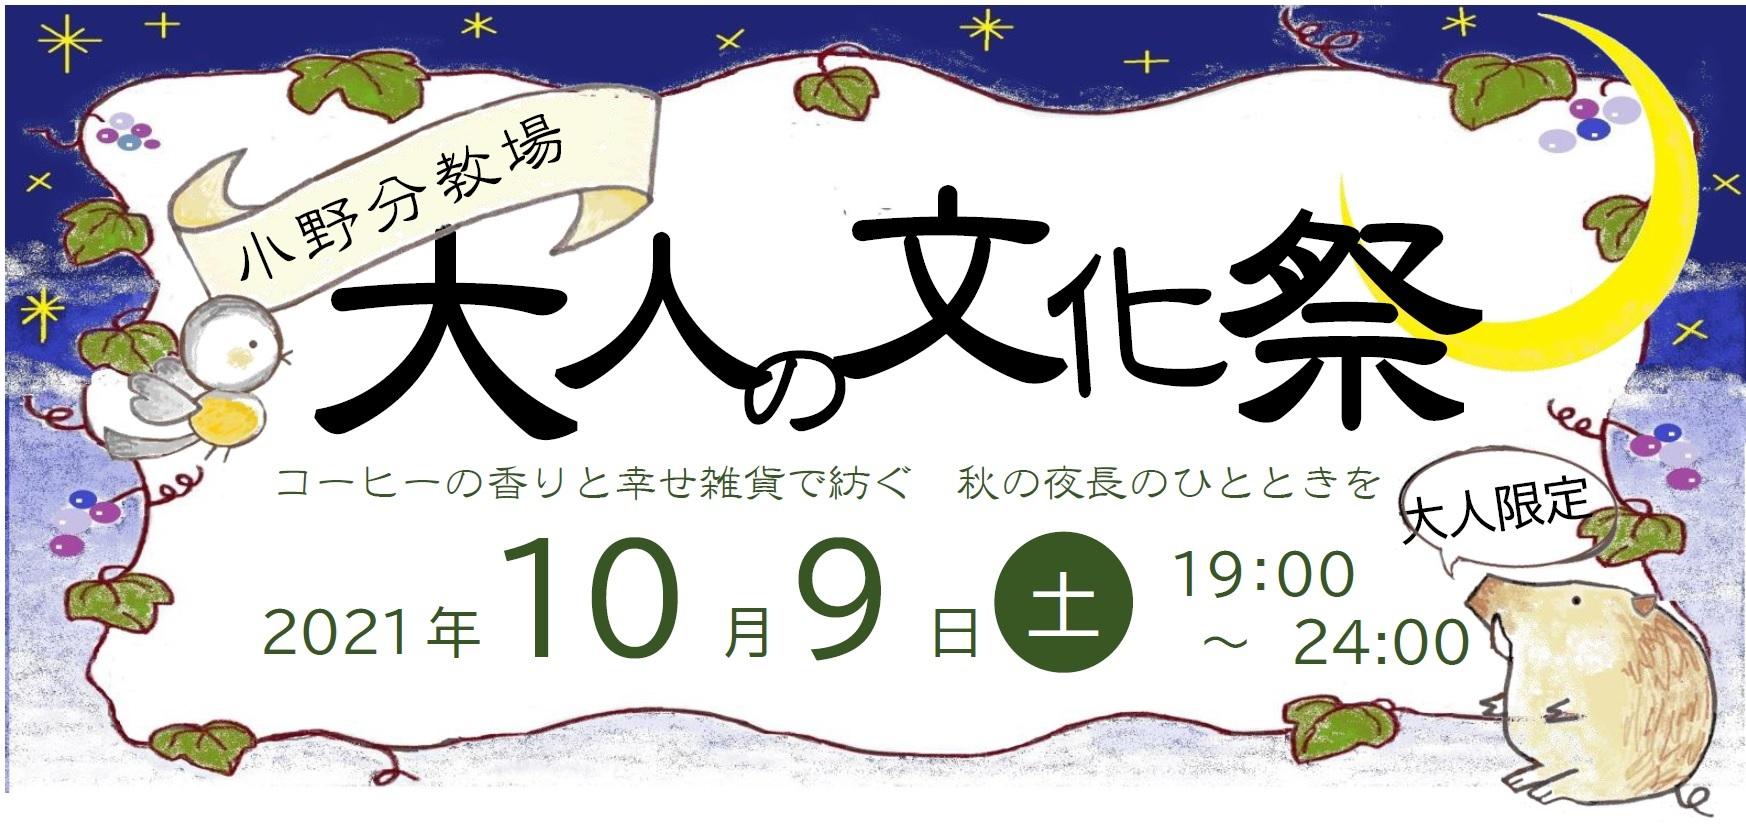 大人の文化祭_b0197139_20323822.jpg